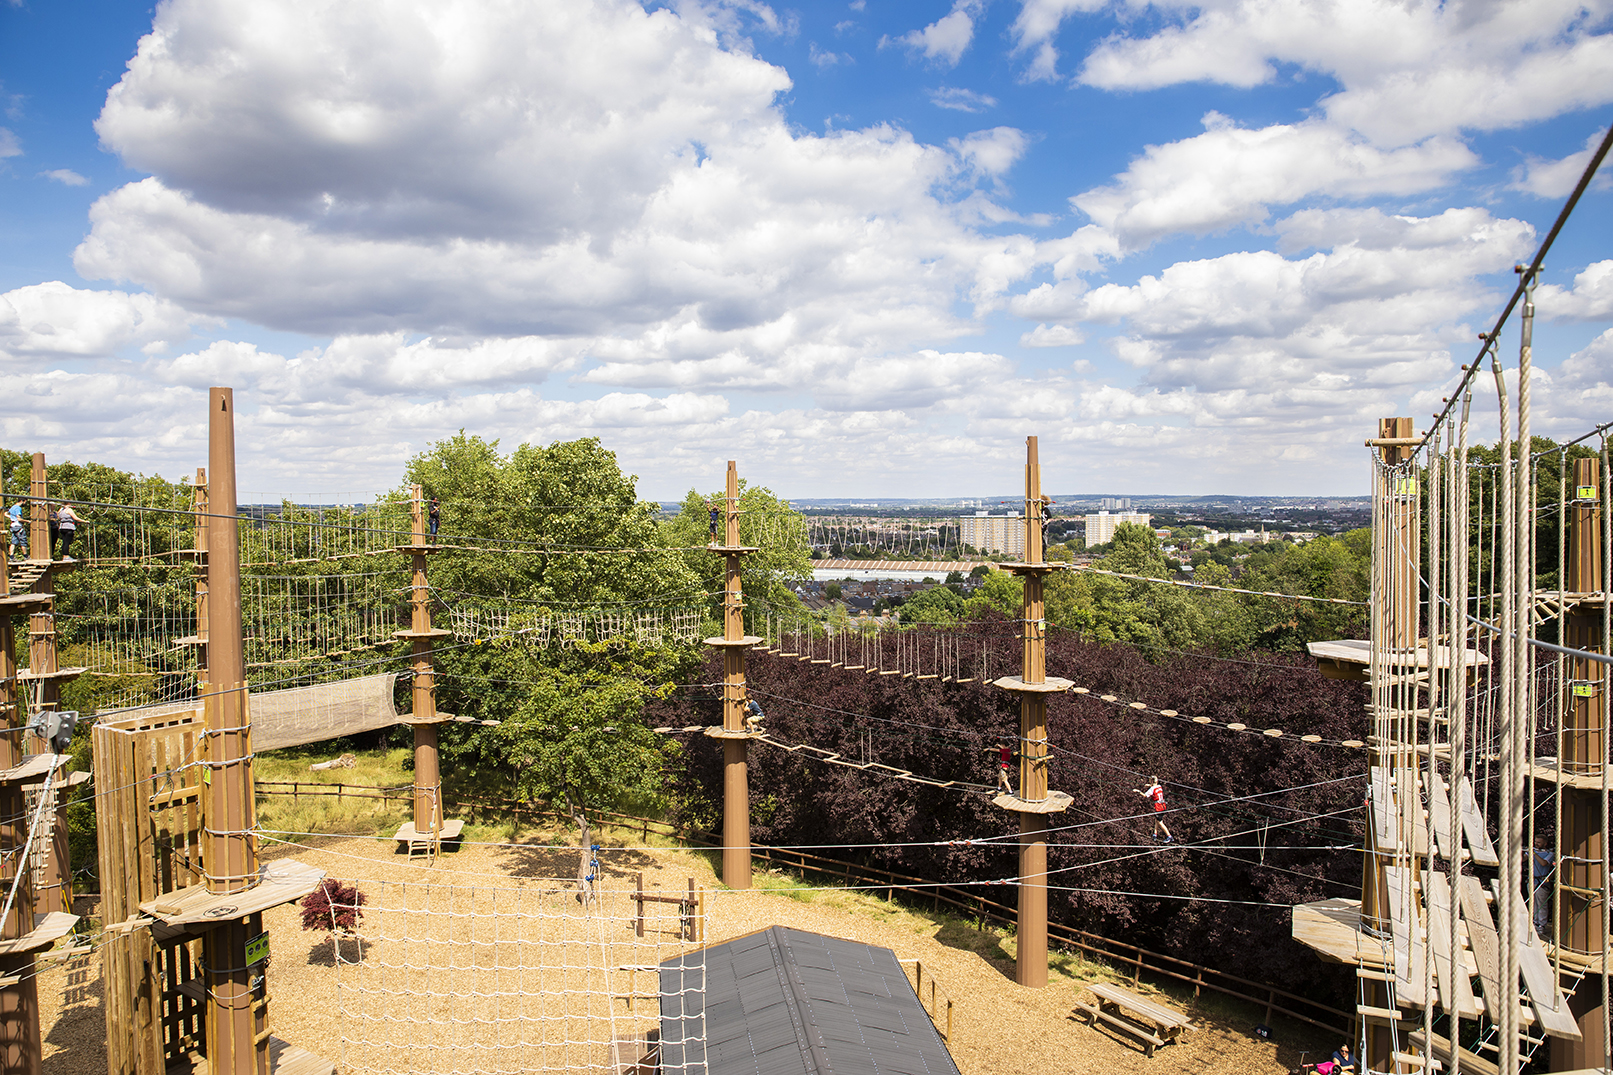 Treetop Challenge Go Ape Alexandra Palace Event Venue Hire Tagvenue Com